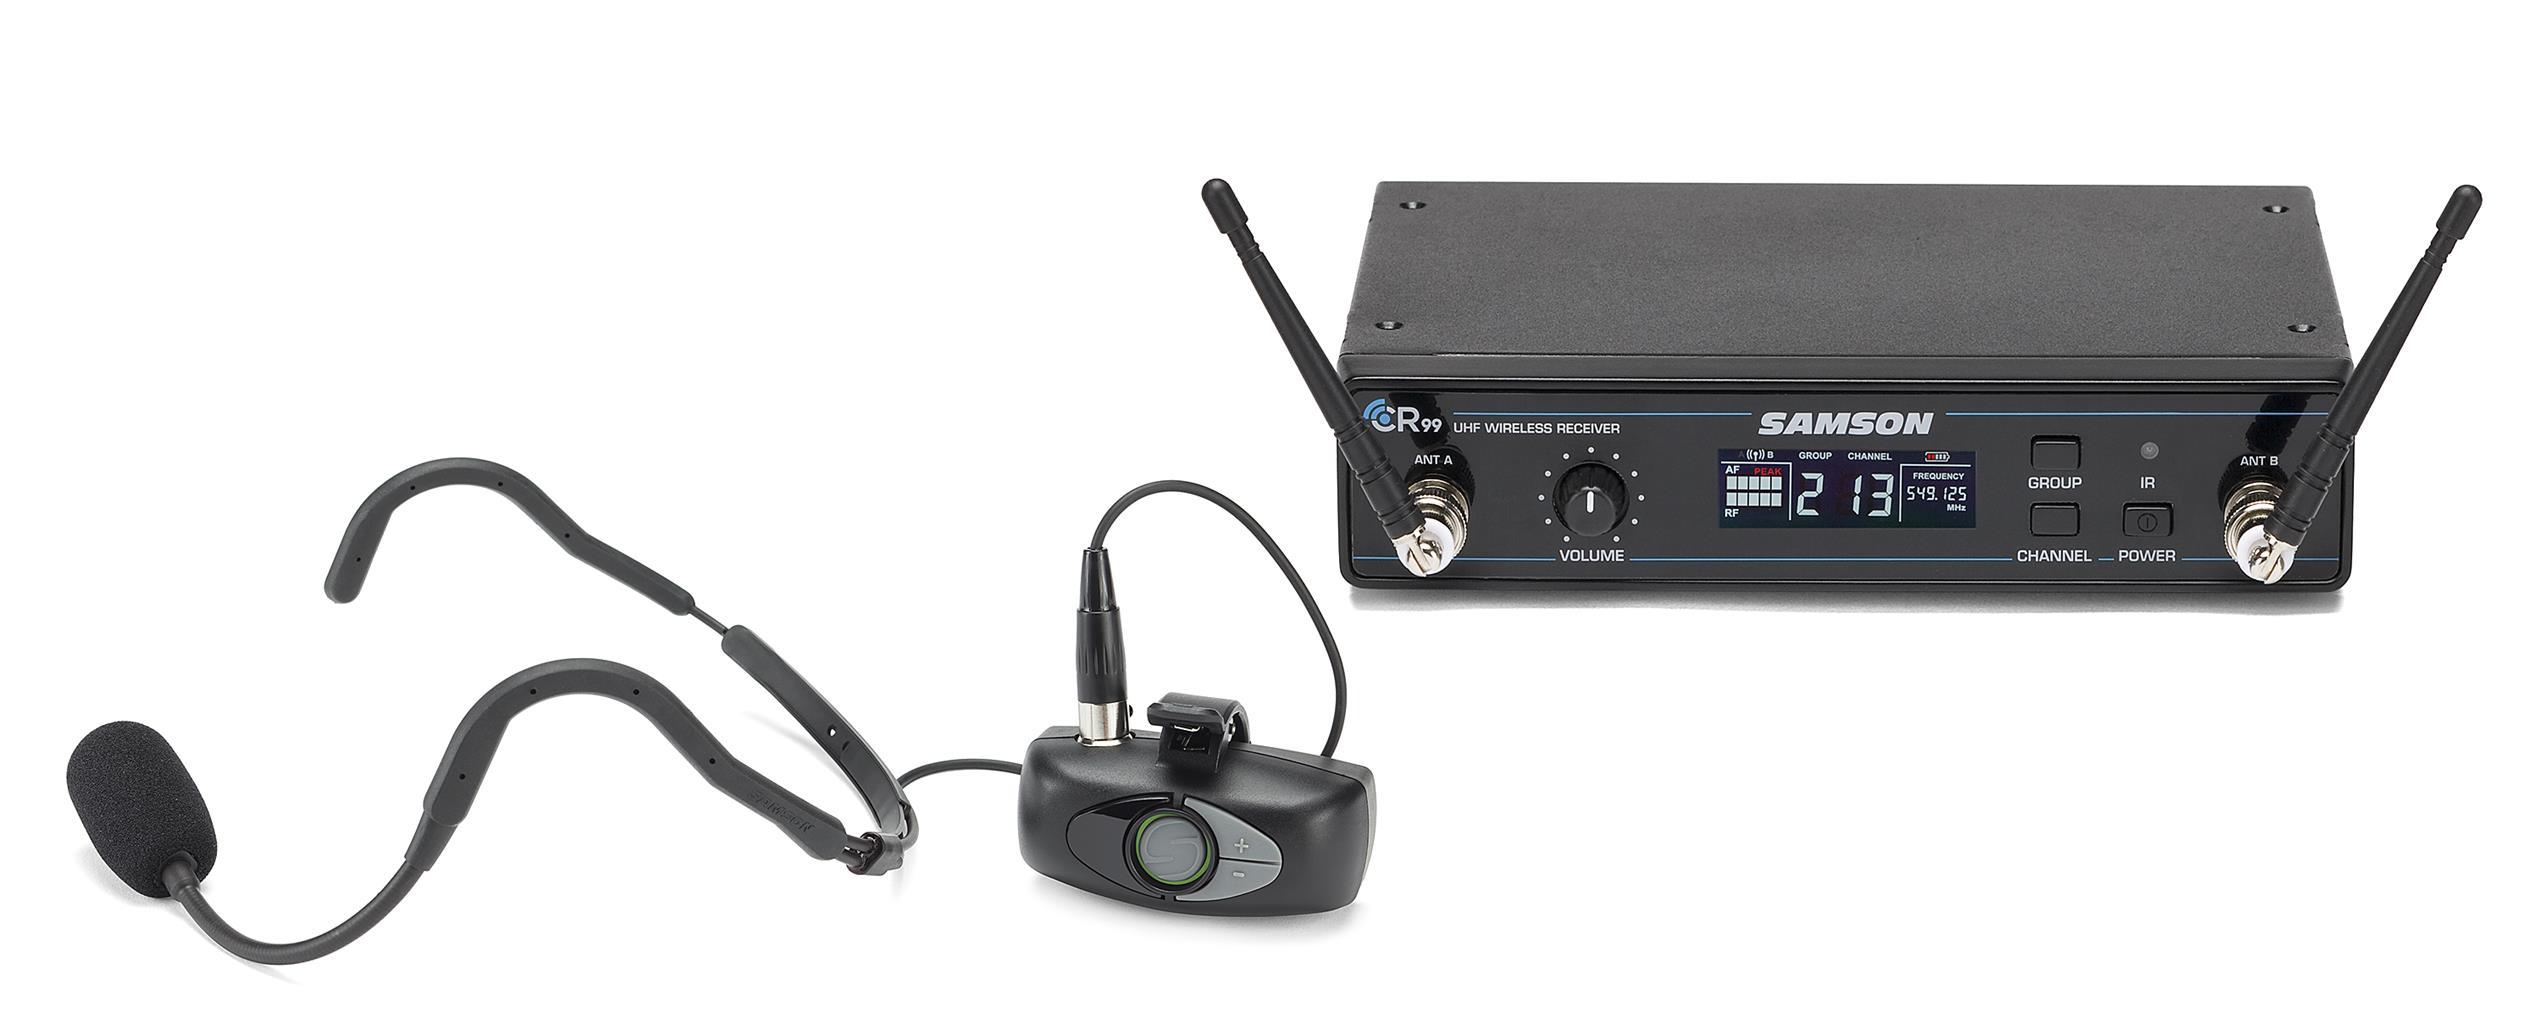 Samson-Airline-AHX-fitness-headset-sku-7649290649002